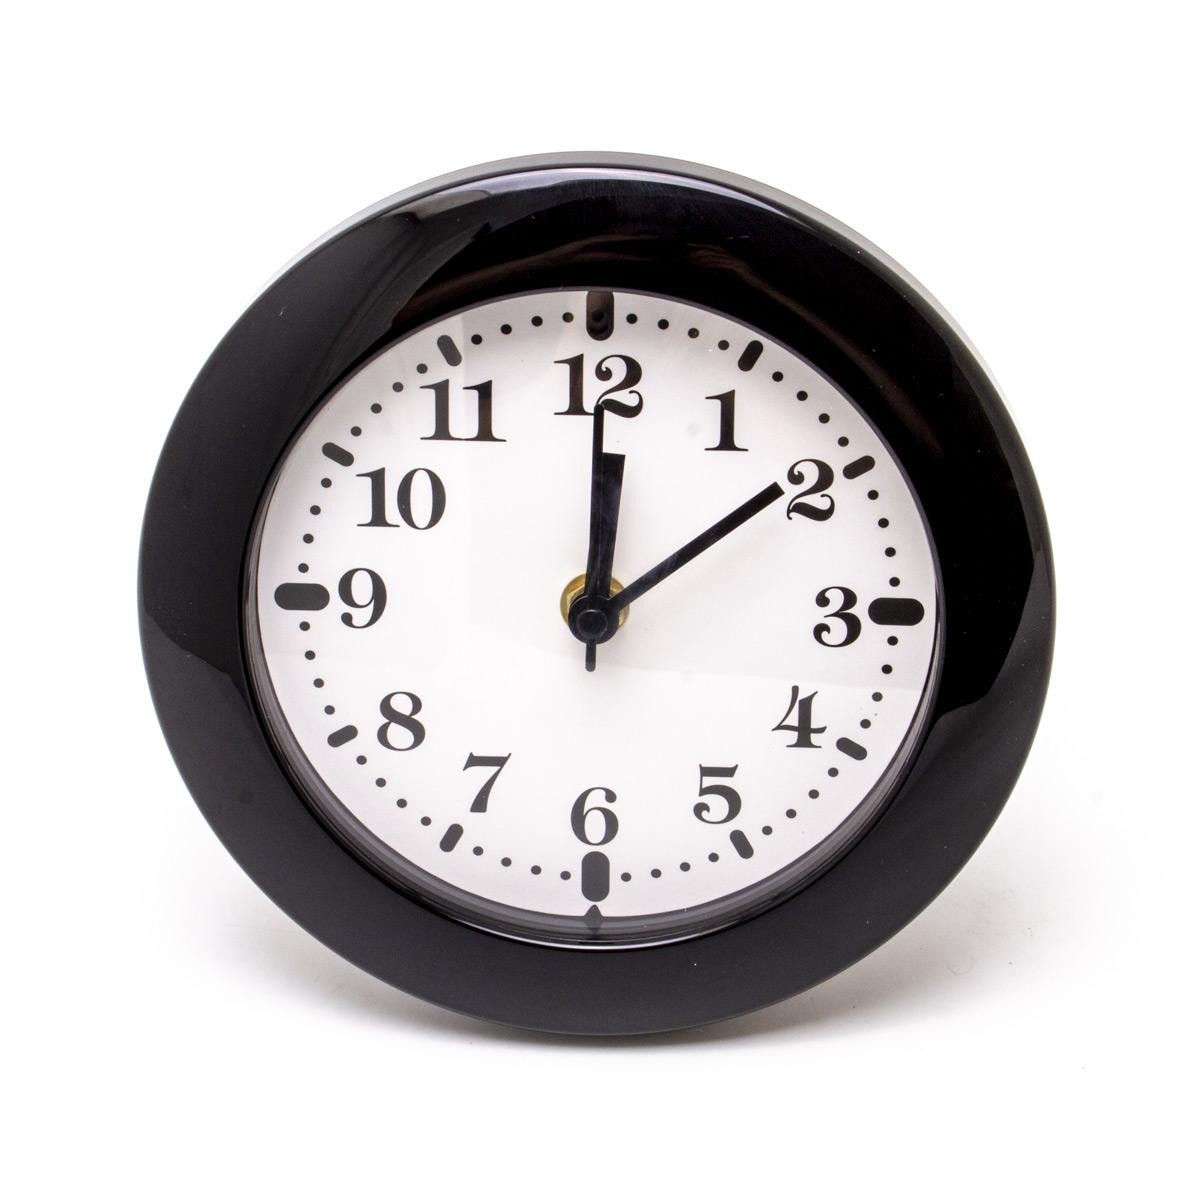 https://www.secutec.fr/media/catalog/product/i/p/ipw-horloge-1080p_00_1.jpg